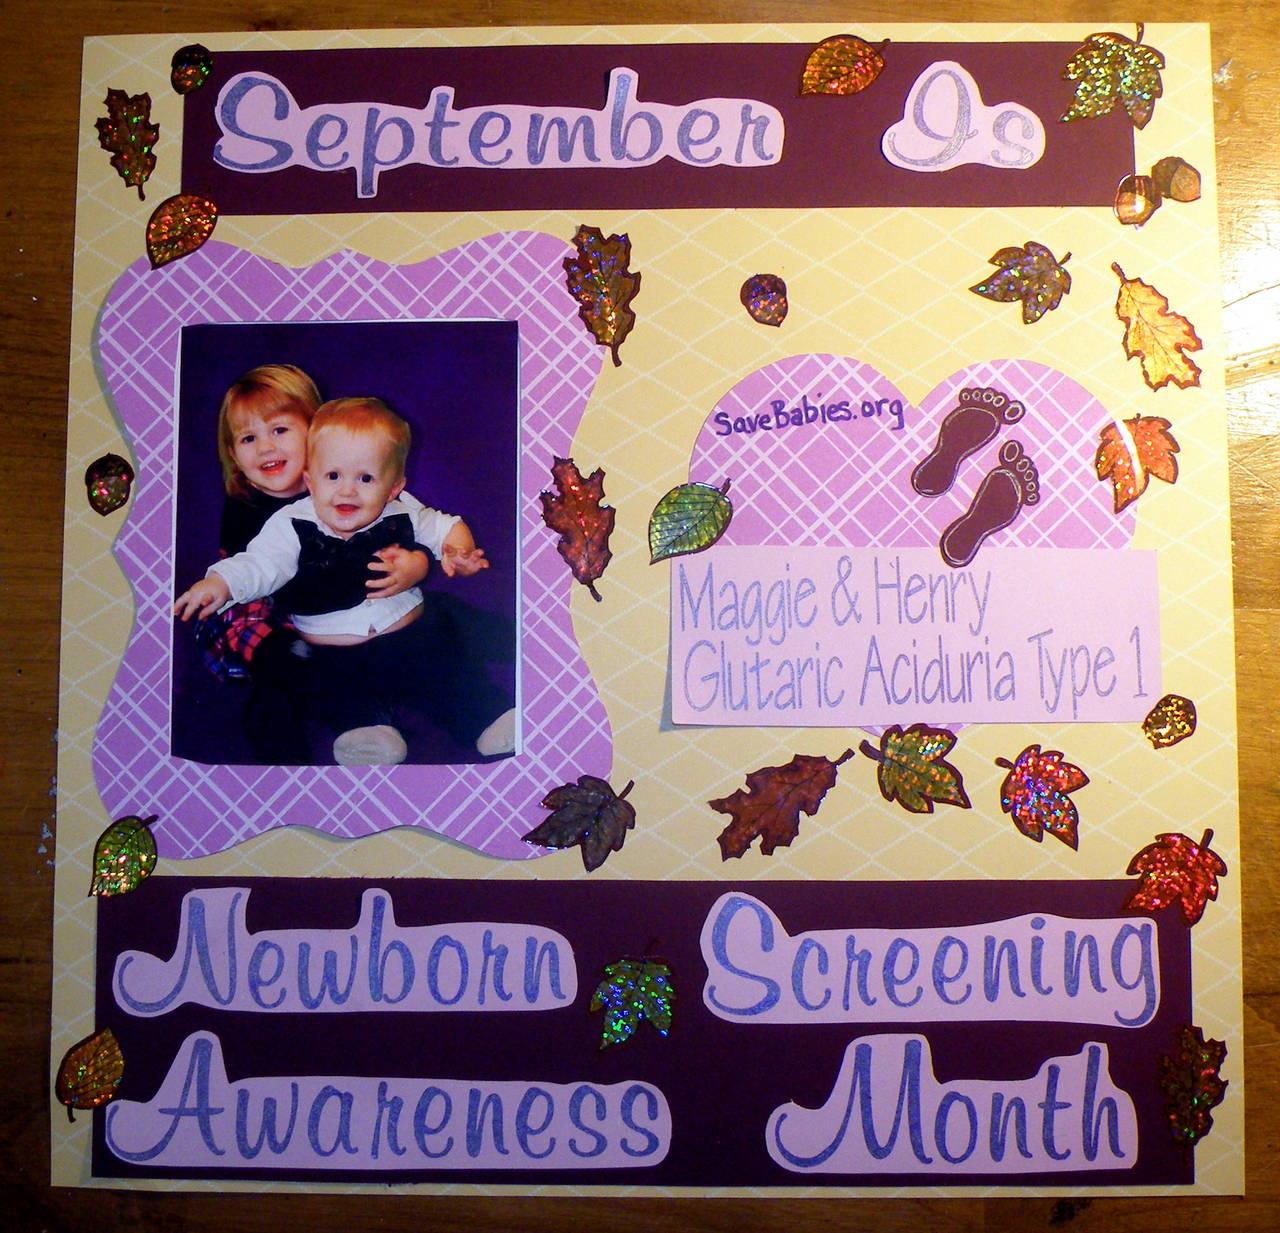 September is Newborn Screening Awareness Month!